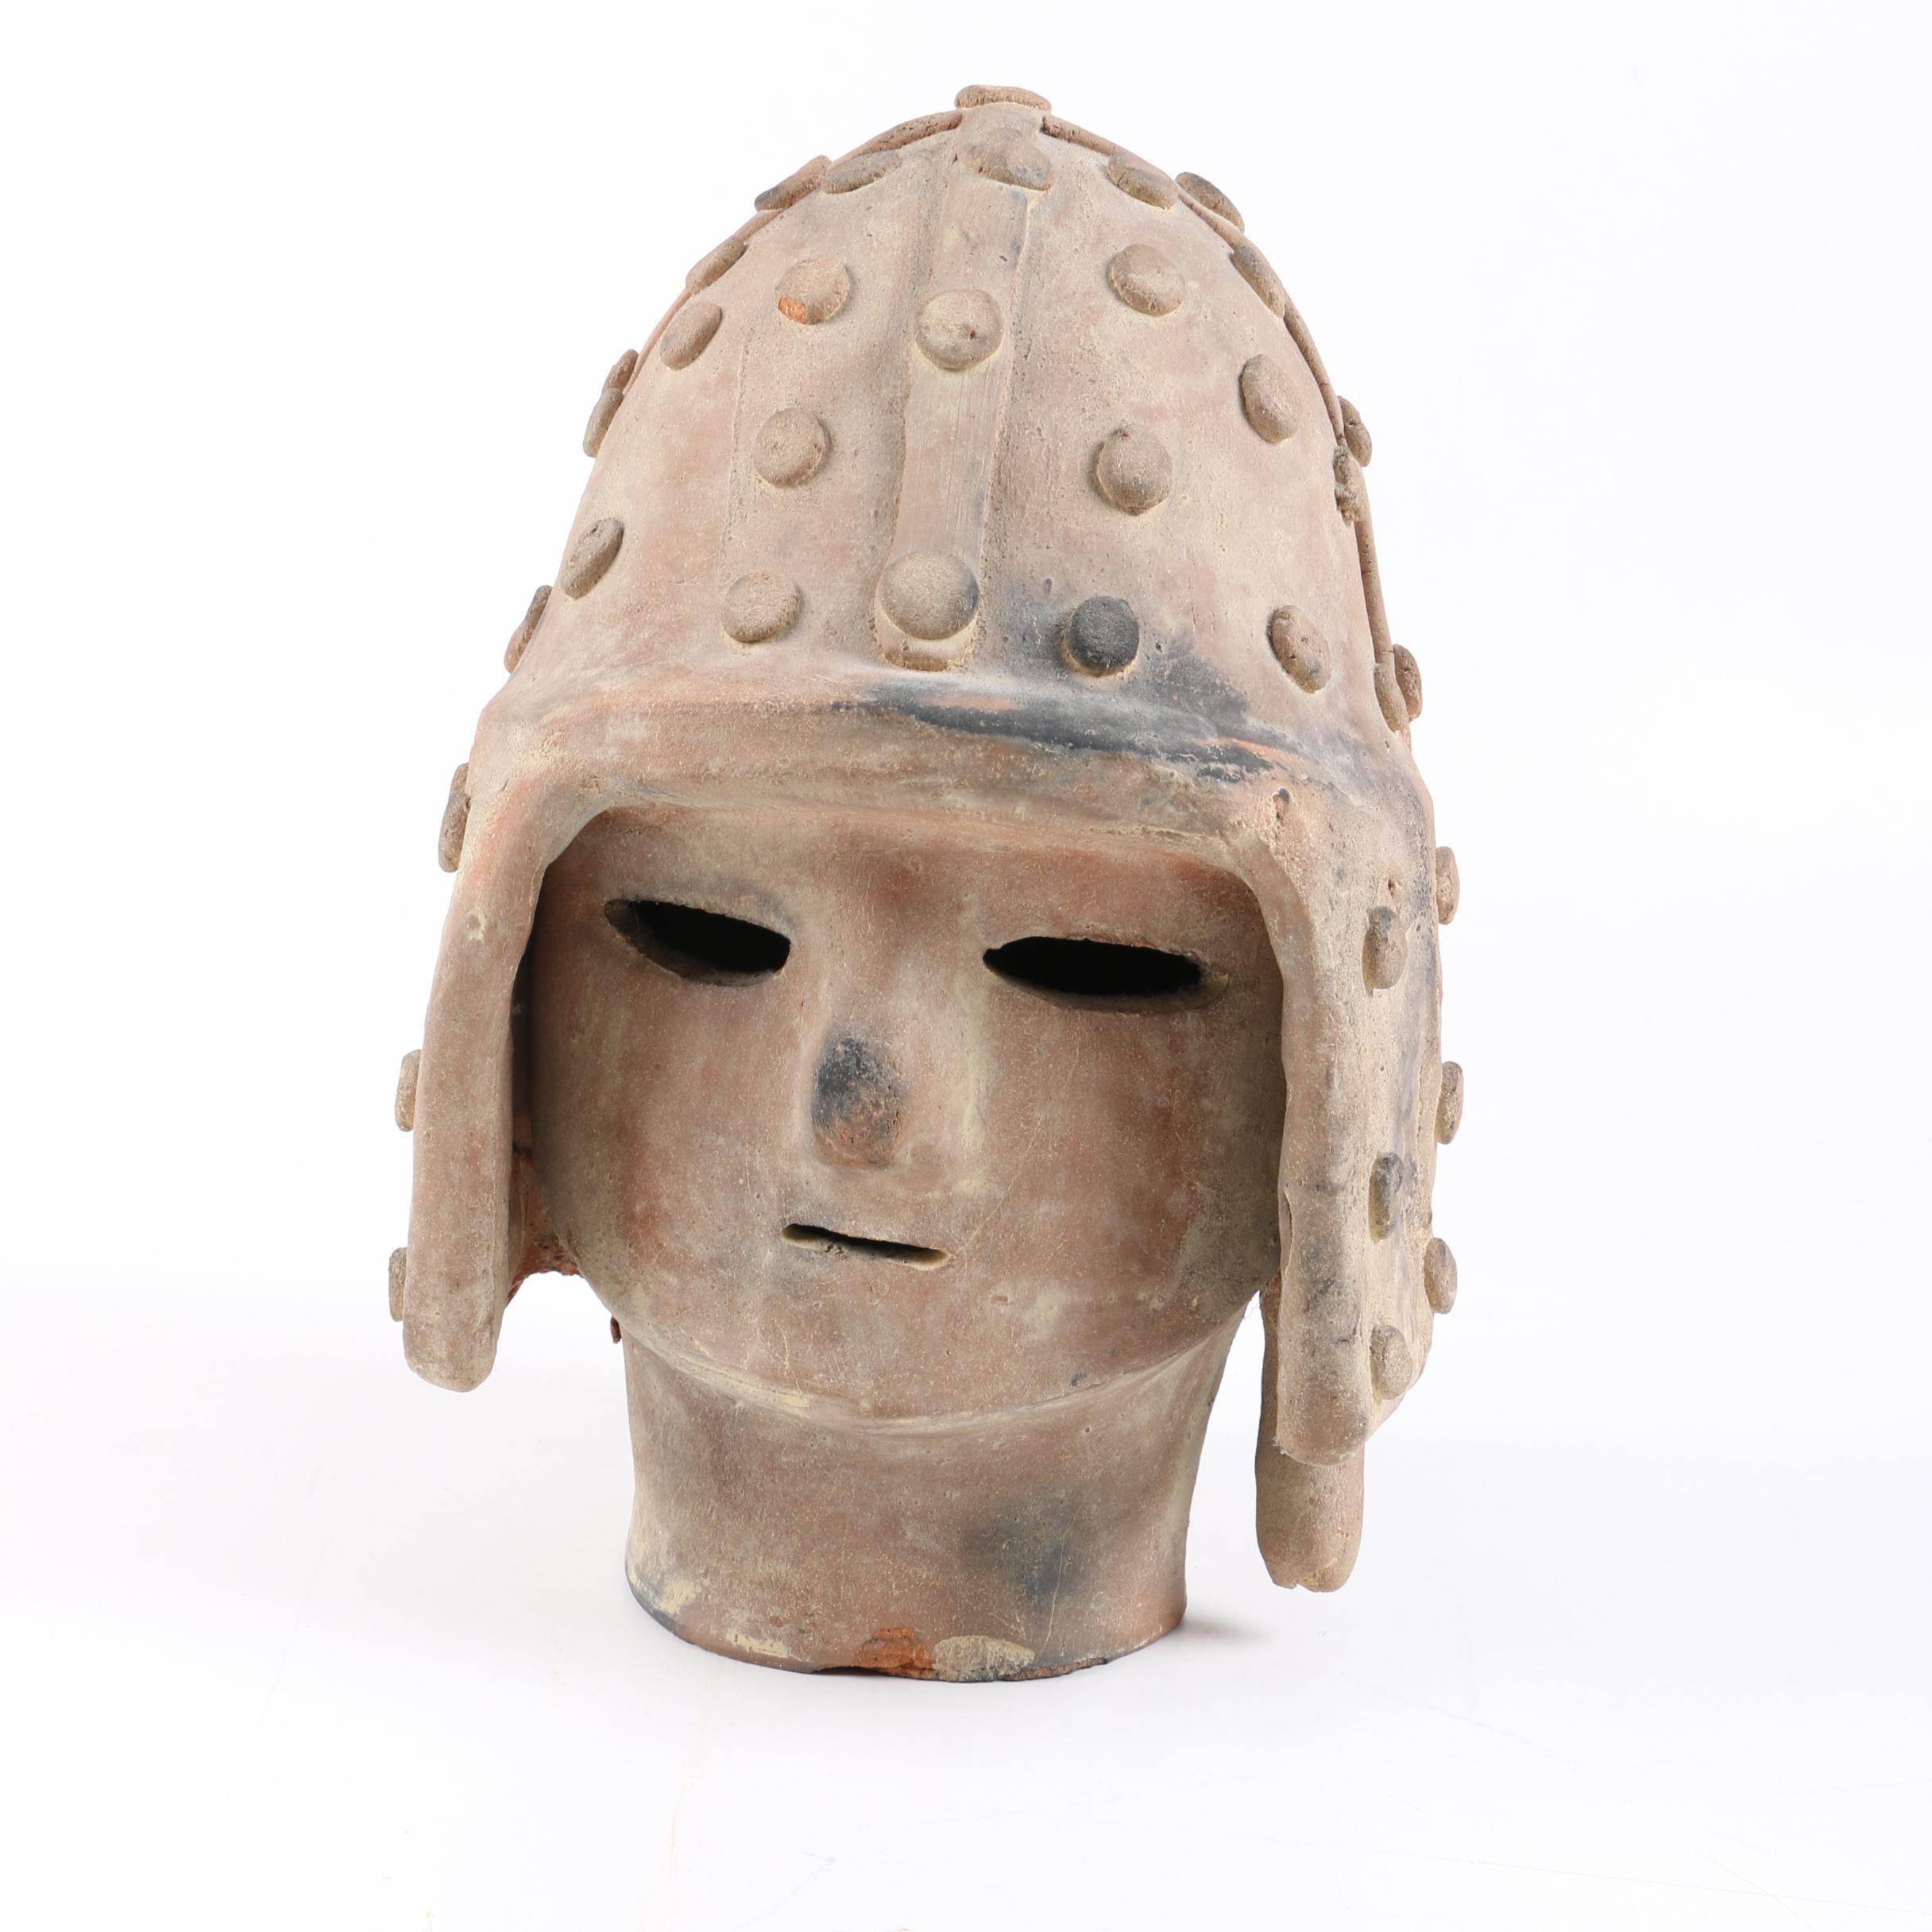 Japanese Haniwa Style Ceramic Head of a Warrior